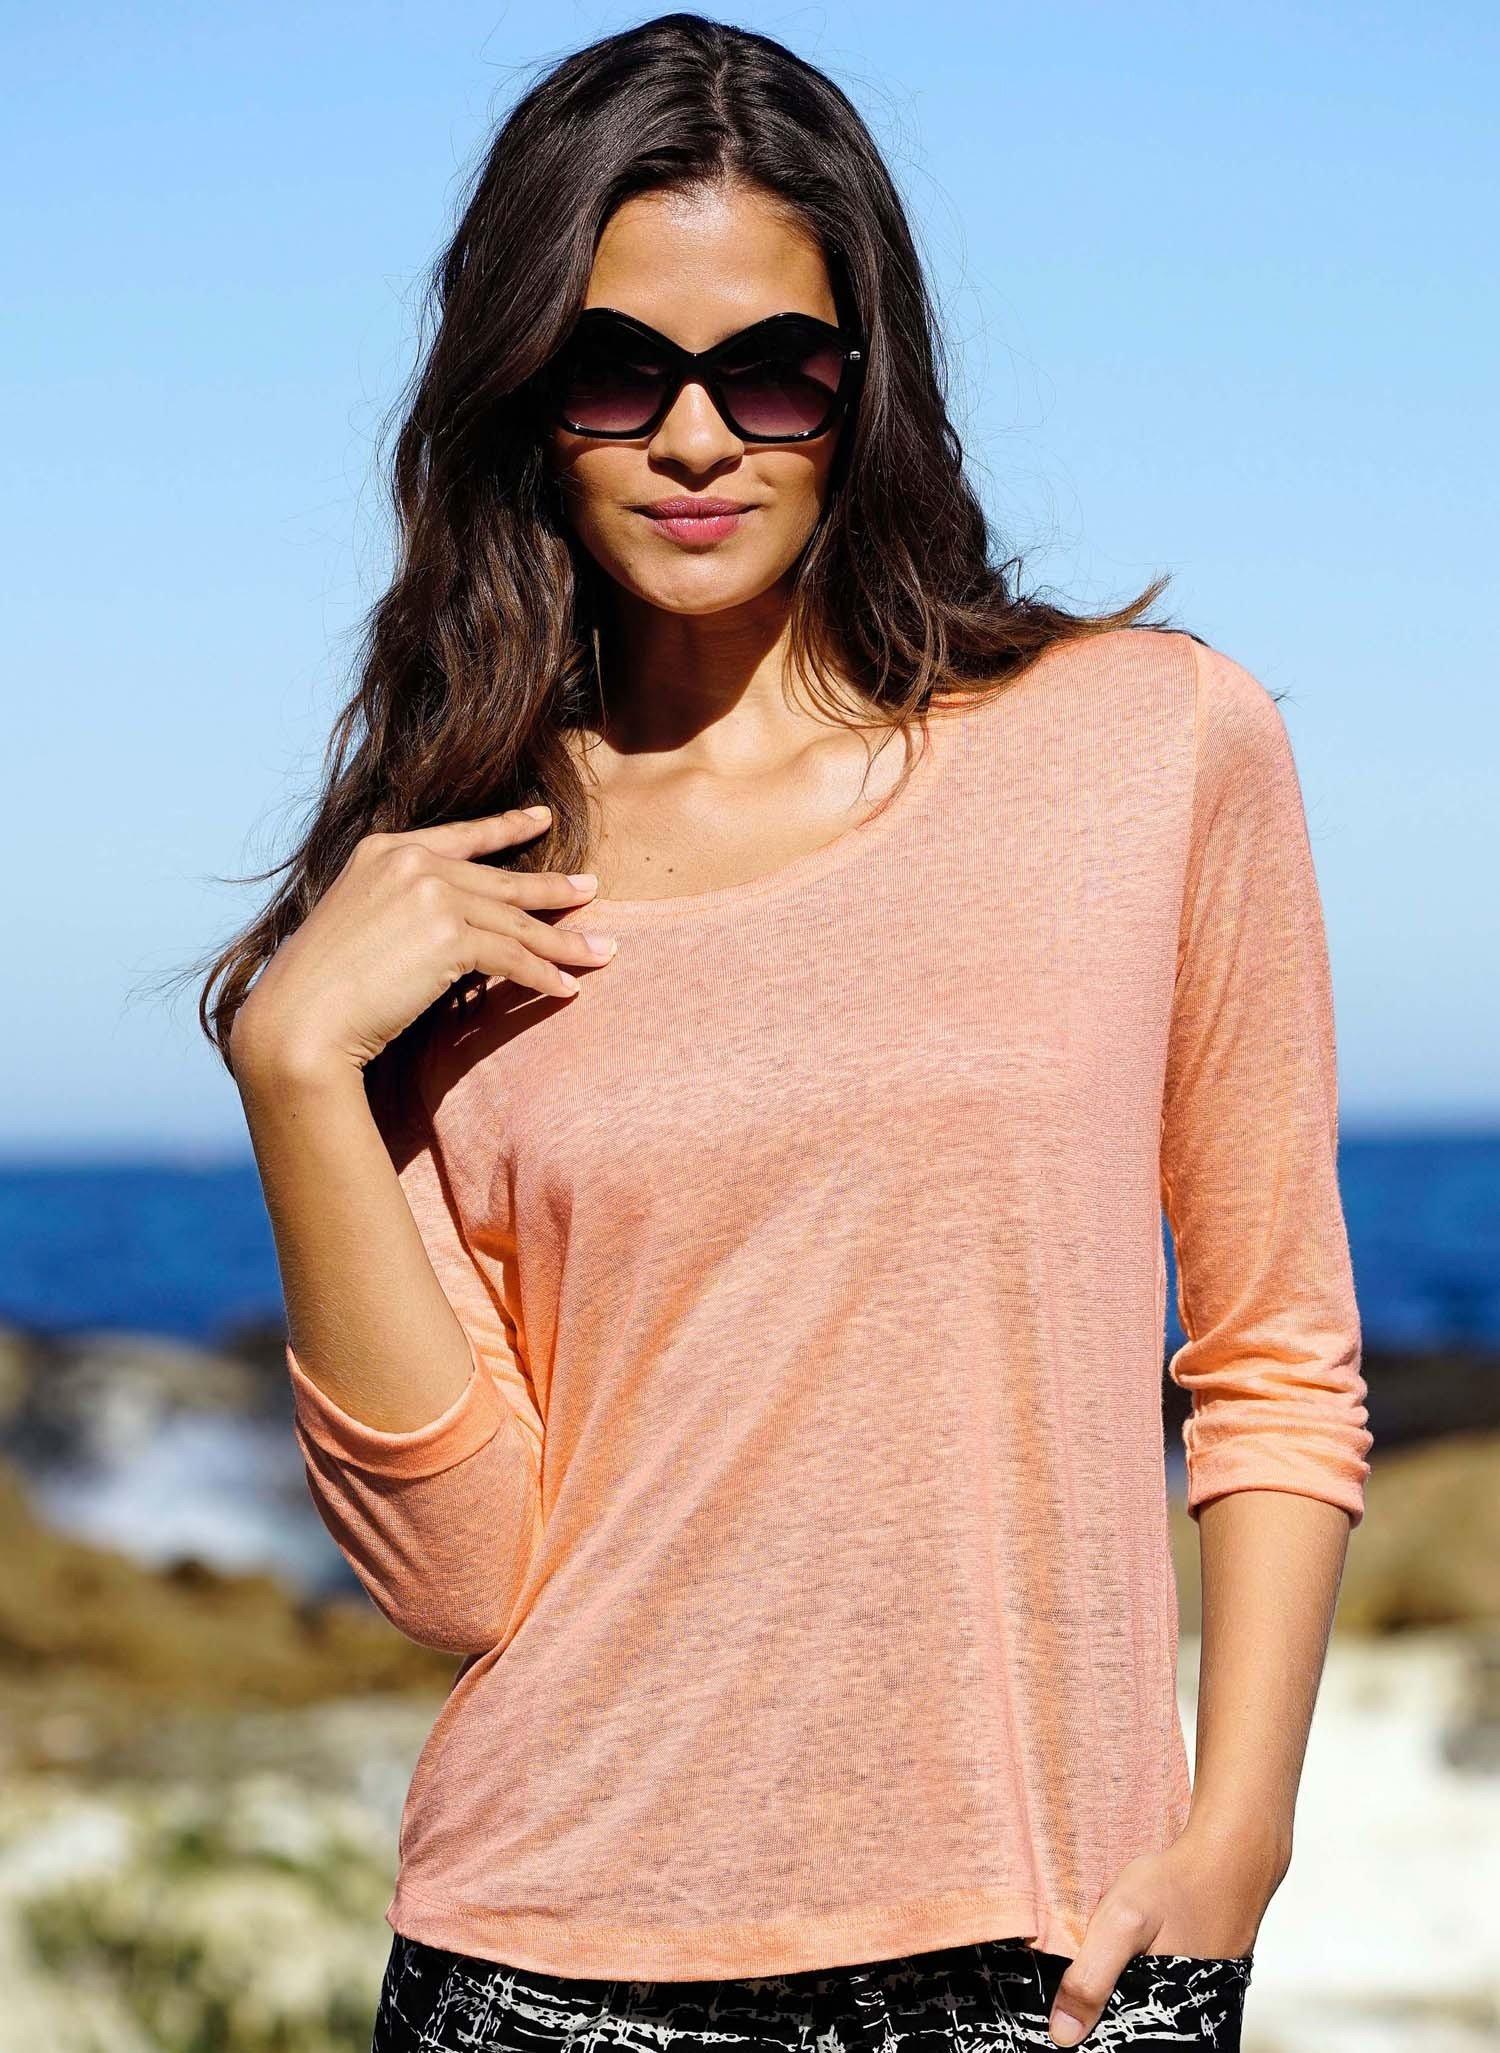 D-3/4-Arm-Shirt,Flammg.apricot L 037 - 4 - Ronja.ch